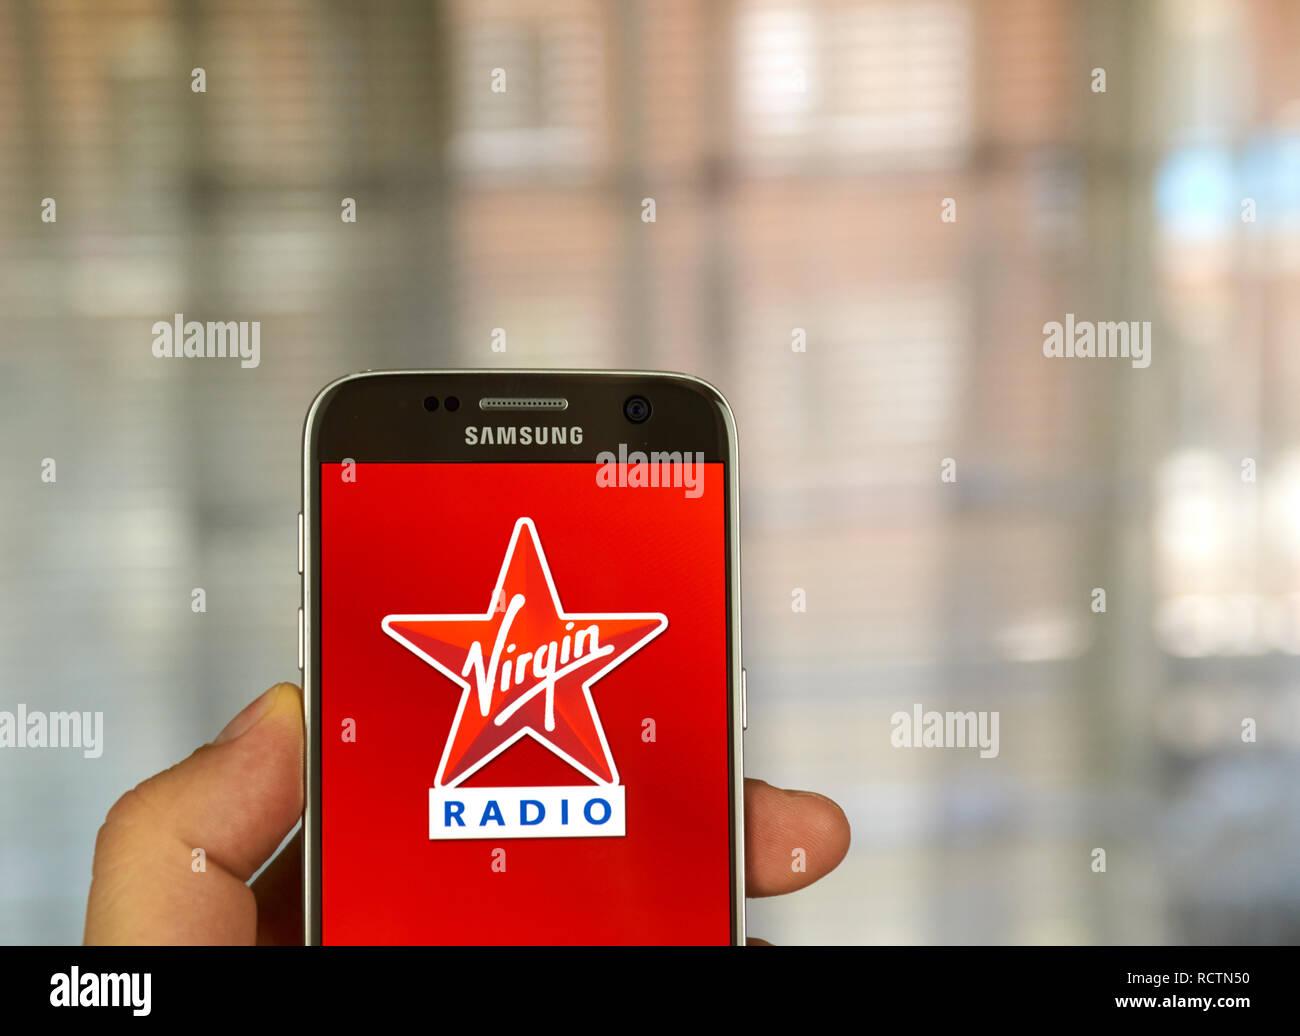 MONTREAL, CANADA - JUNE 24, 2016 : Virgin Radio android